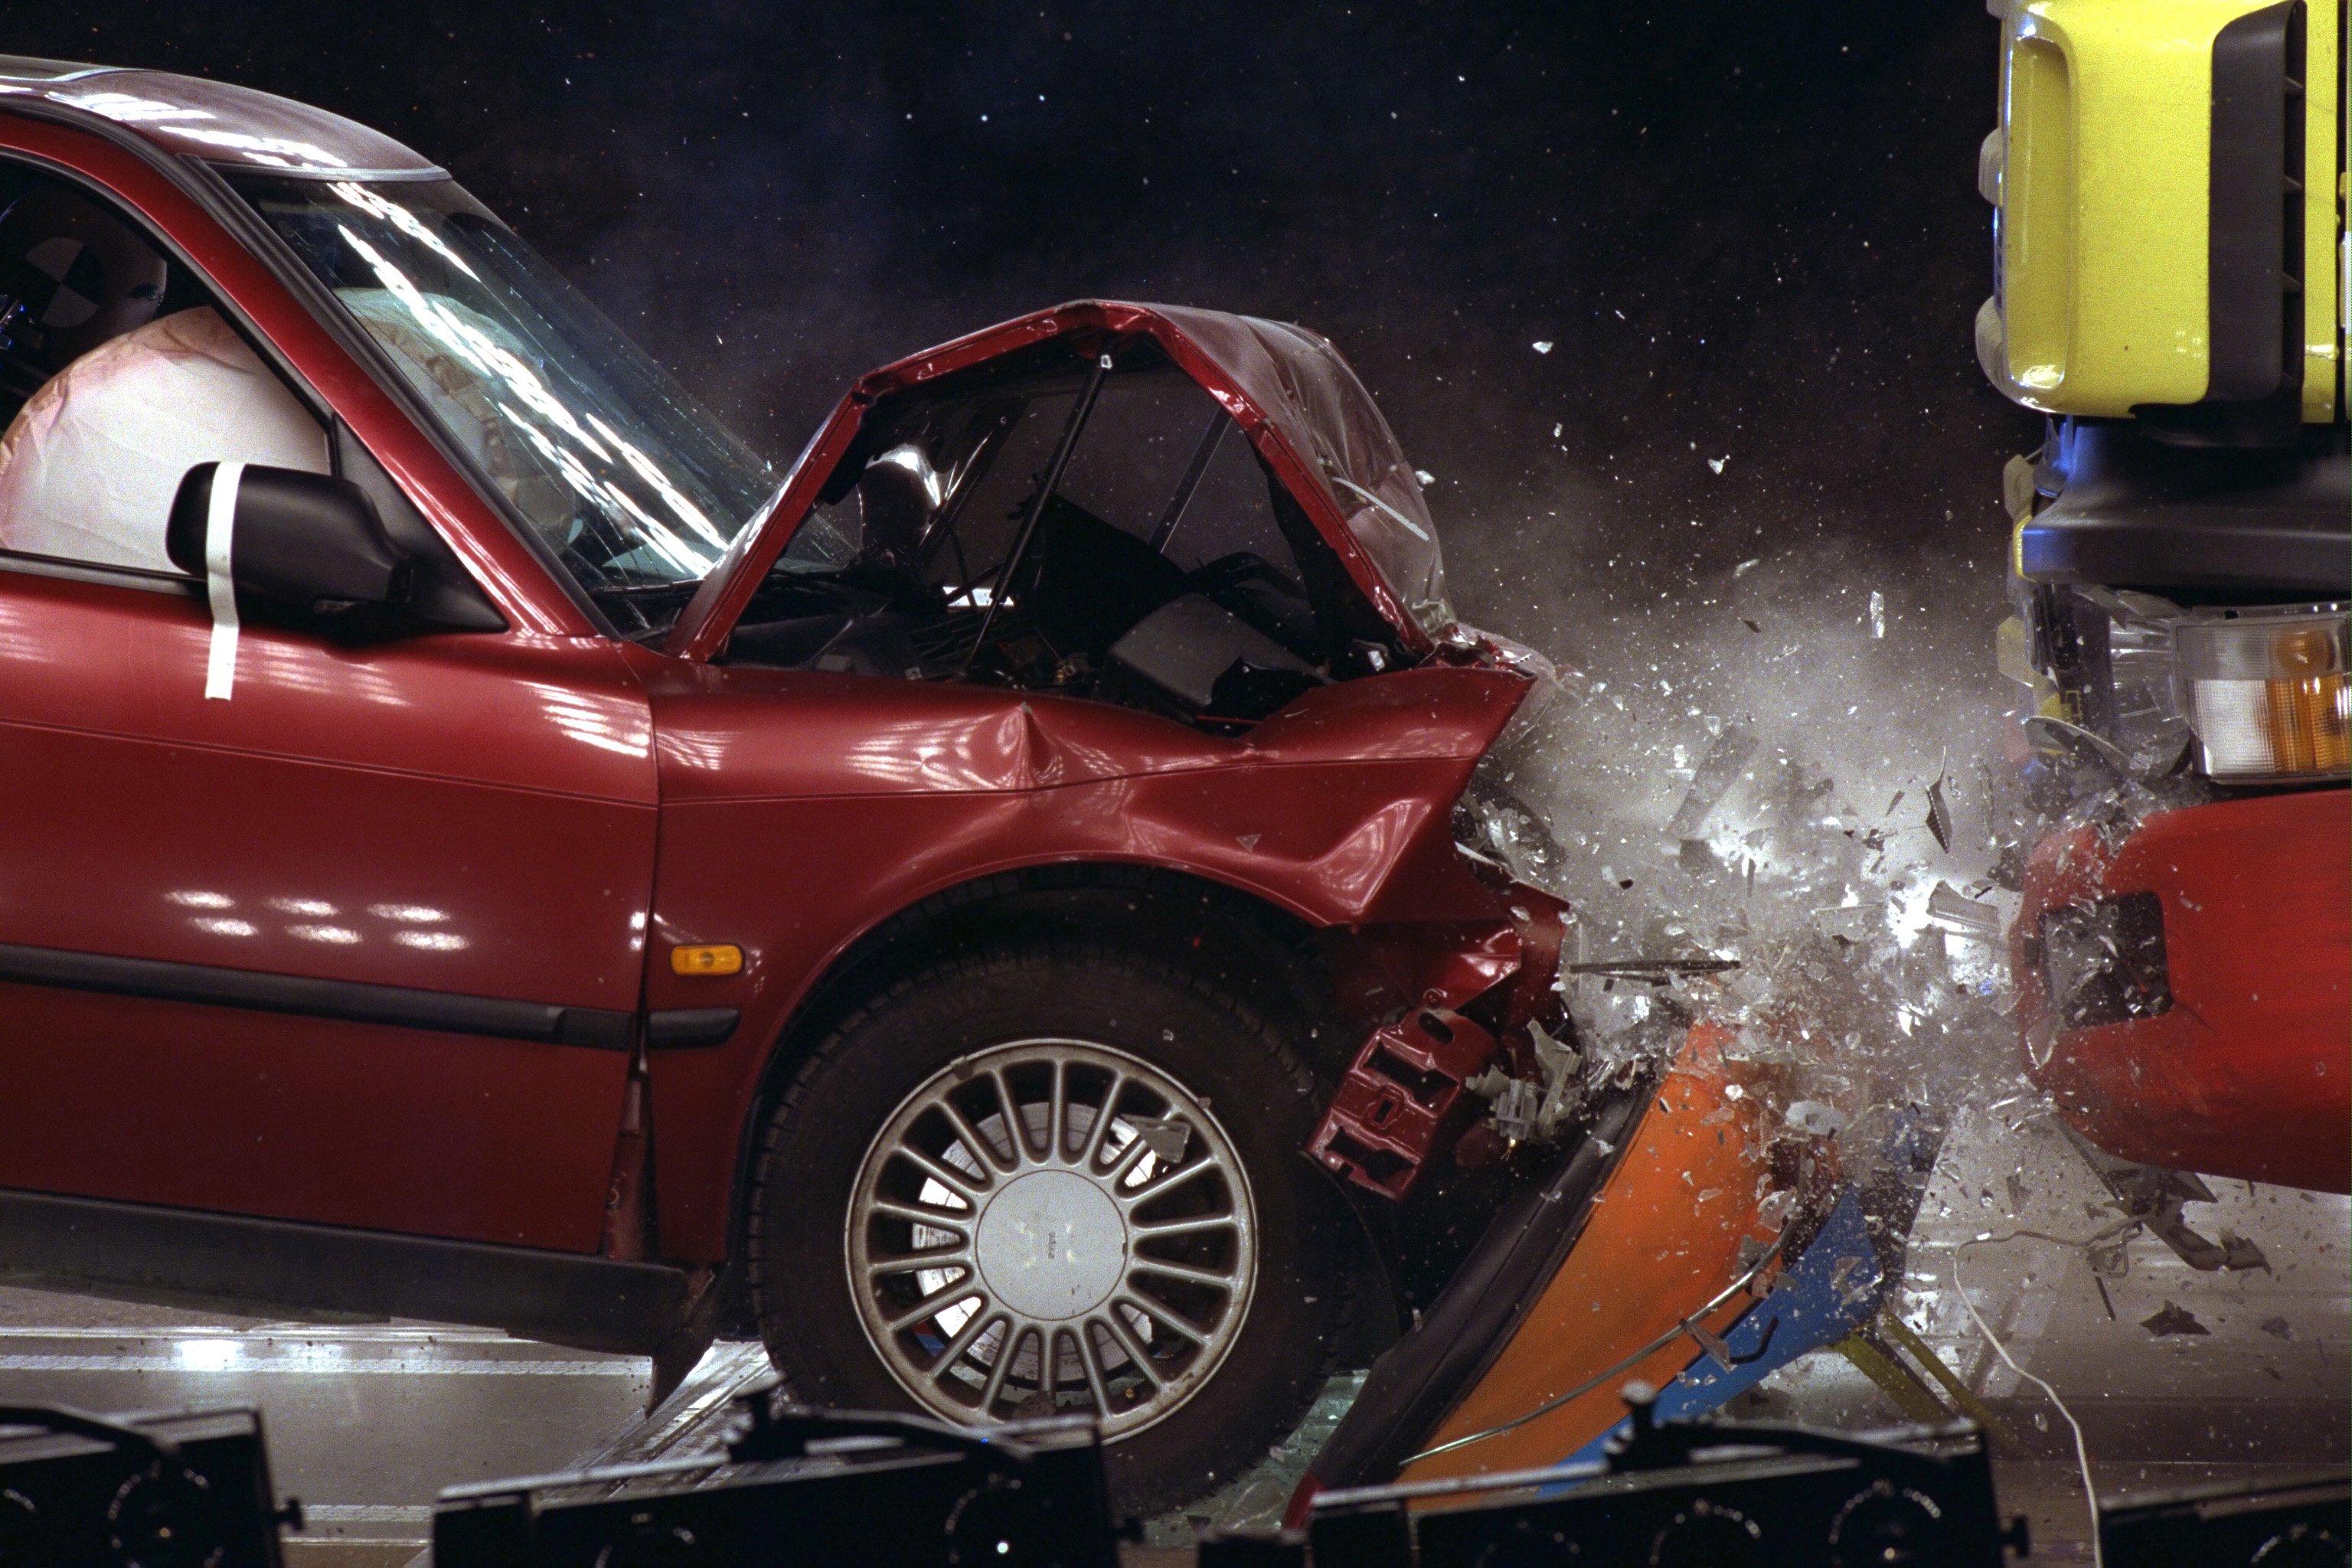 Delitos de trânsito e dolo eventual